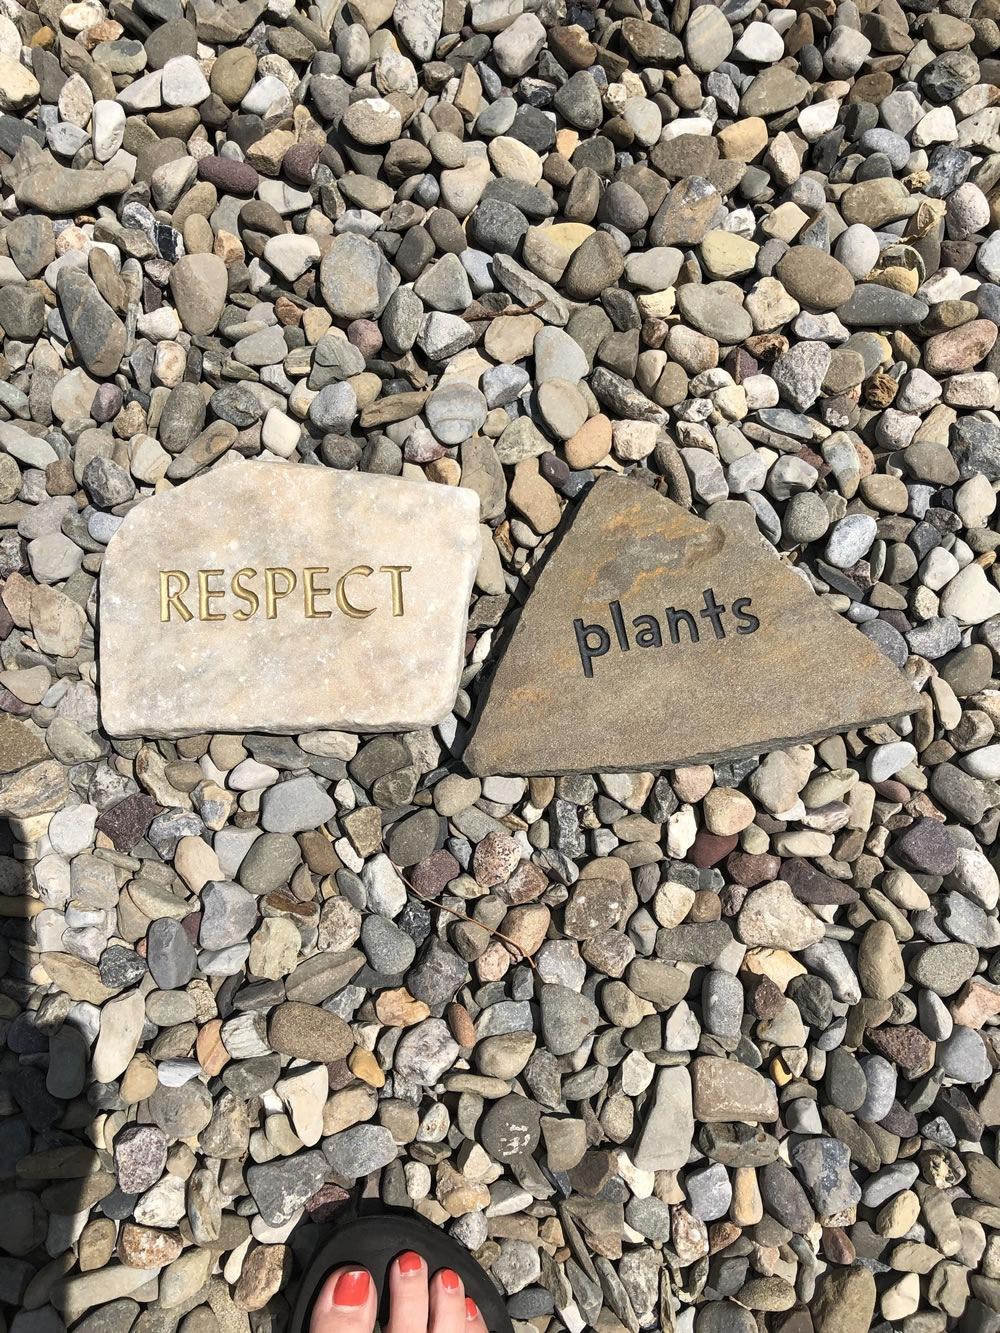 bartlett-arboretum-20190905-00018